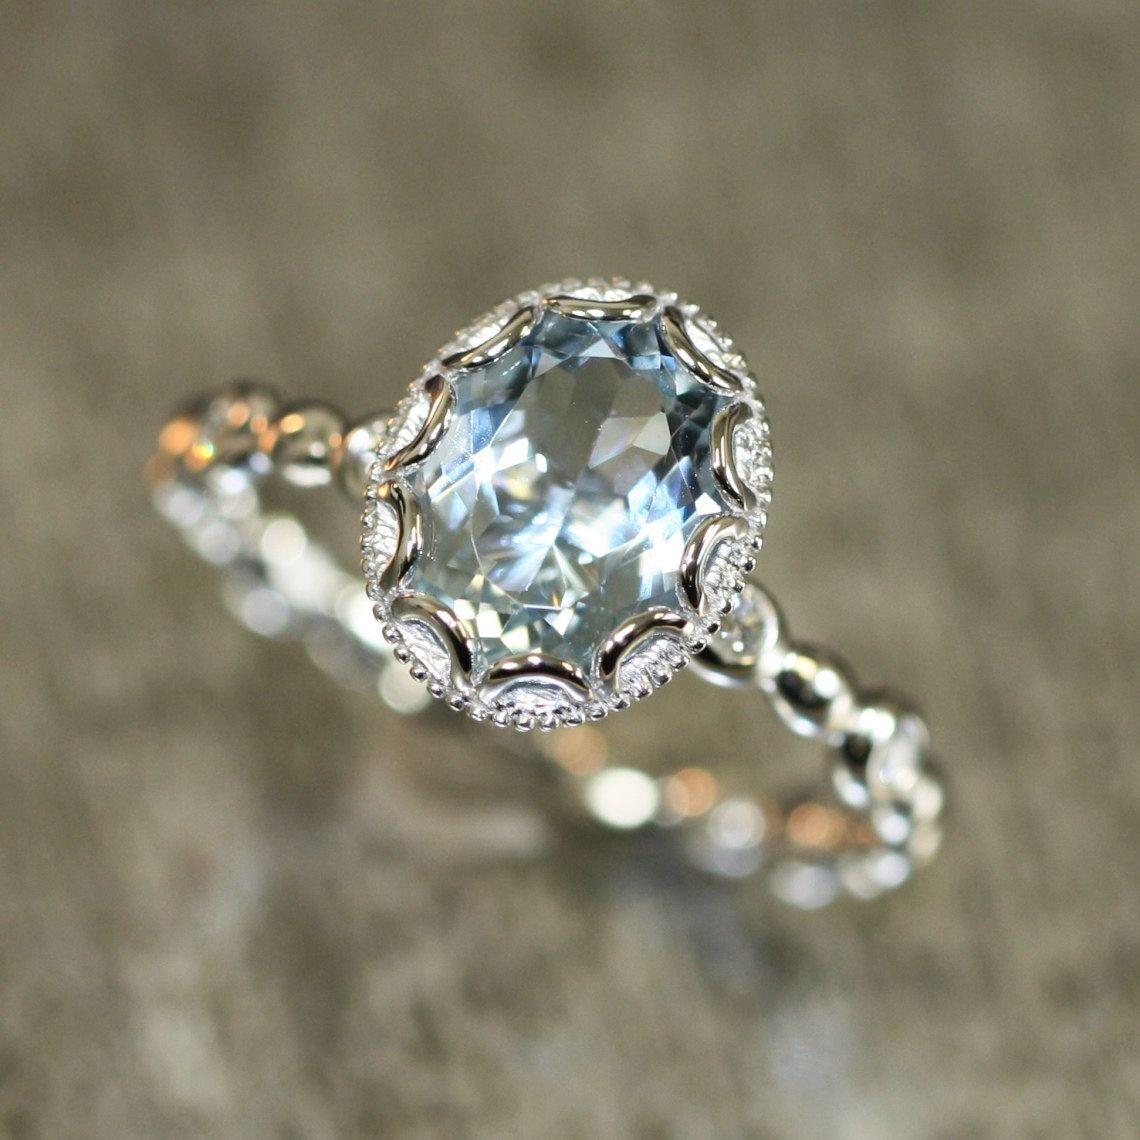 birthstone wedding rings Floral Aquamarine Engagement Ring in 14k White Gold Pebble Diamond Wedding Band mm Oval Aquamarine Ring March Birthstone Gemstone Ring